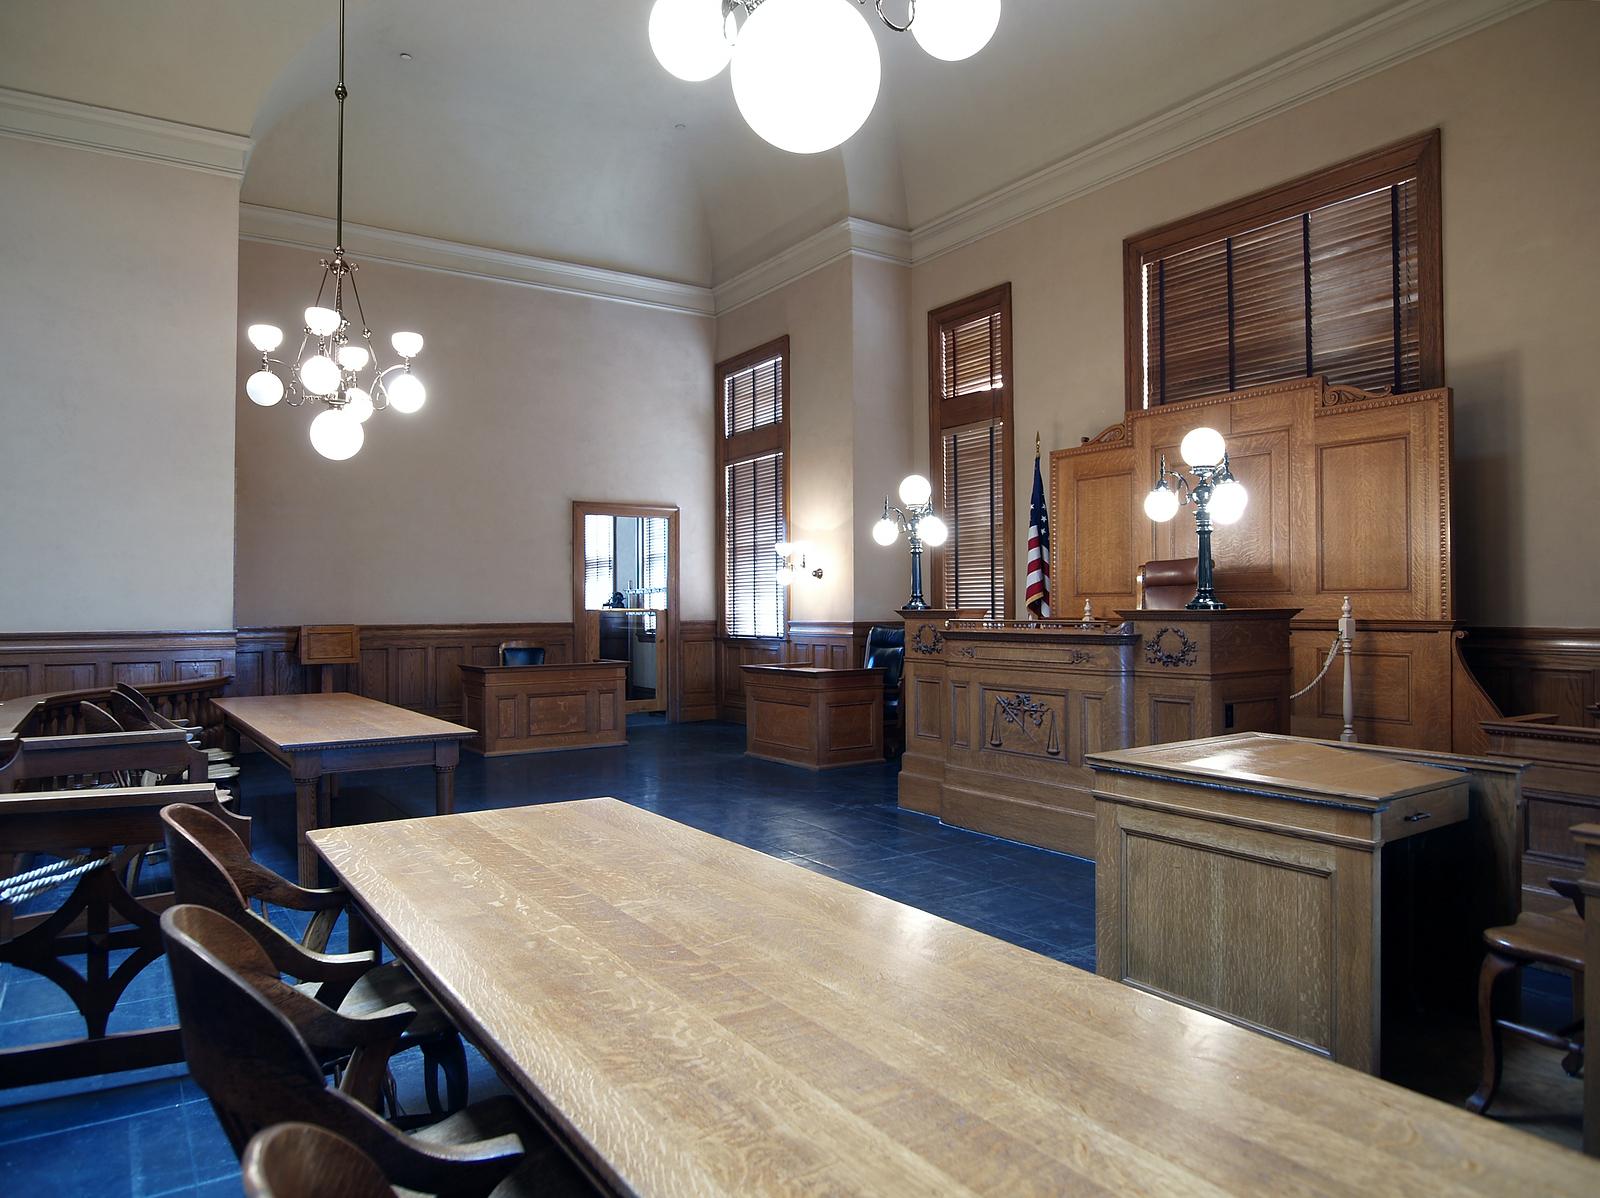 bigstock-County-Court-Tables-6996222.jpg